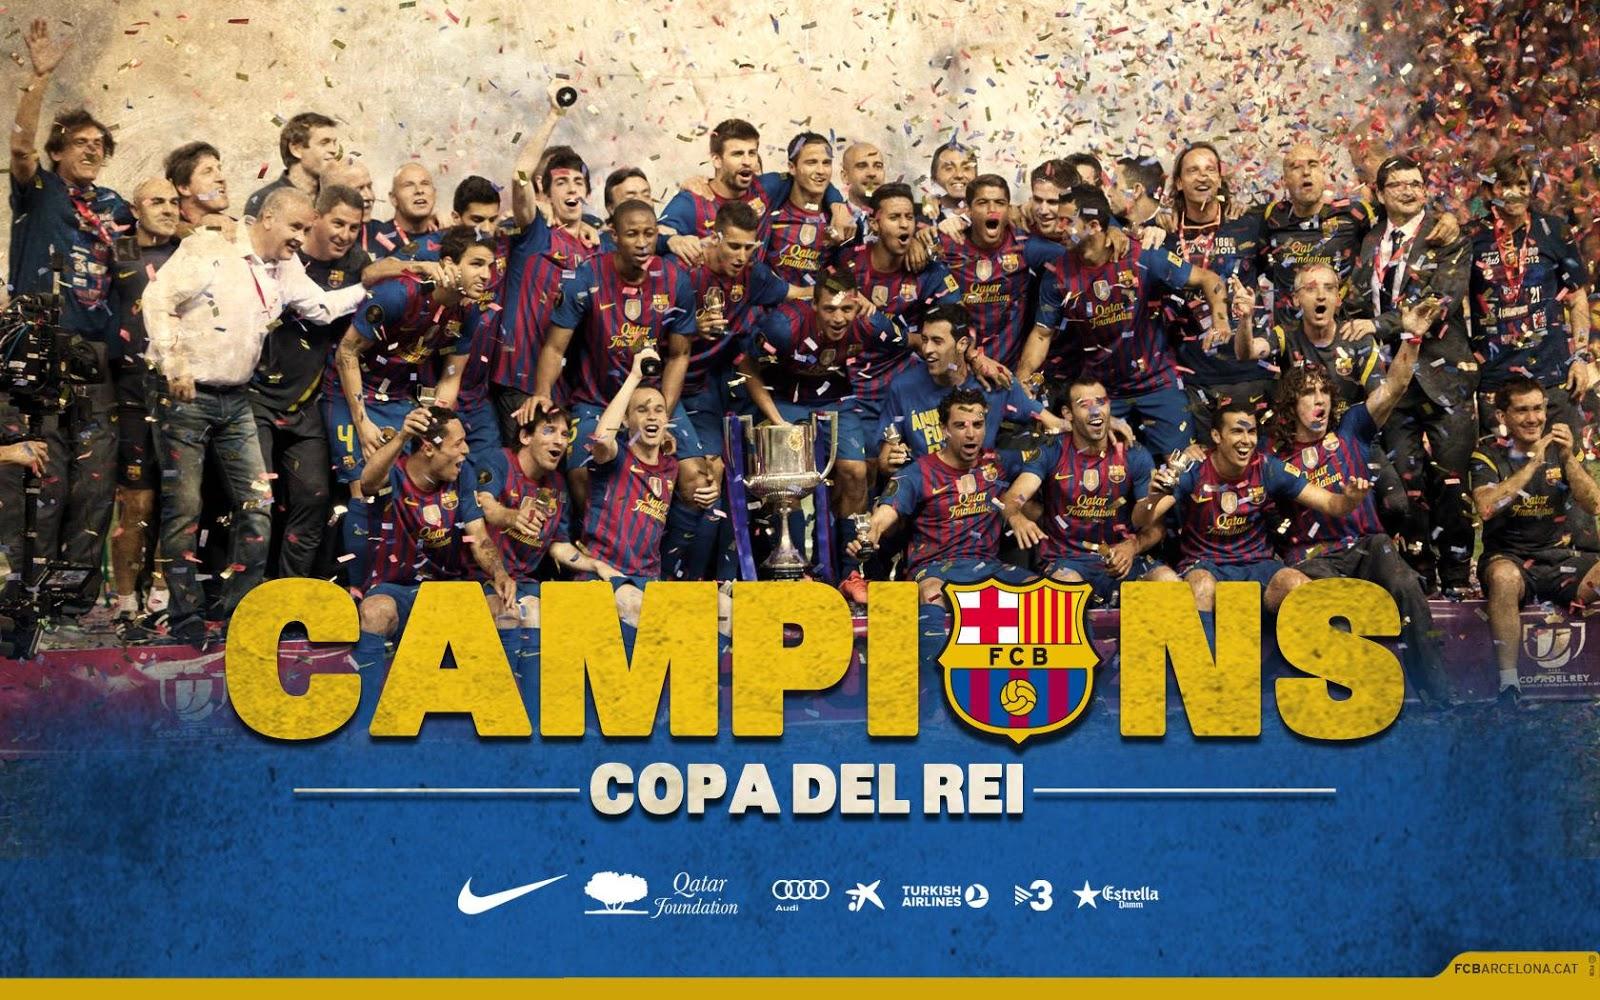 http://1.bp.blogspot.com/-fLfuiXH4Unw/UPEk_OTog1I/AAAAAAAAFkM/FgIsGIokjBs/s1600/FC+Barcelona+Team+Cool+HD+Wallpapers+2013_2.jpg